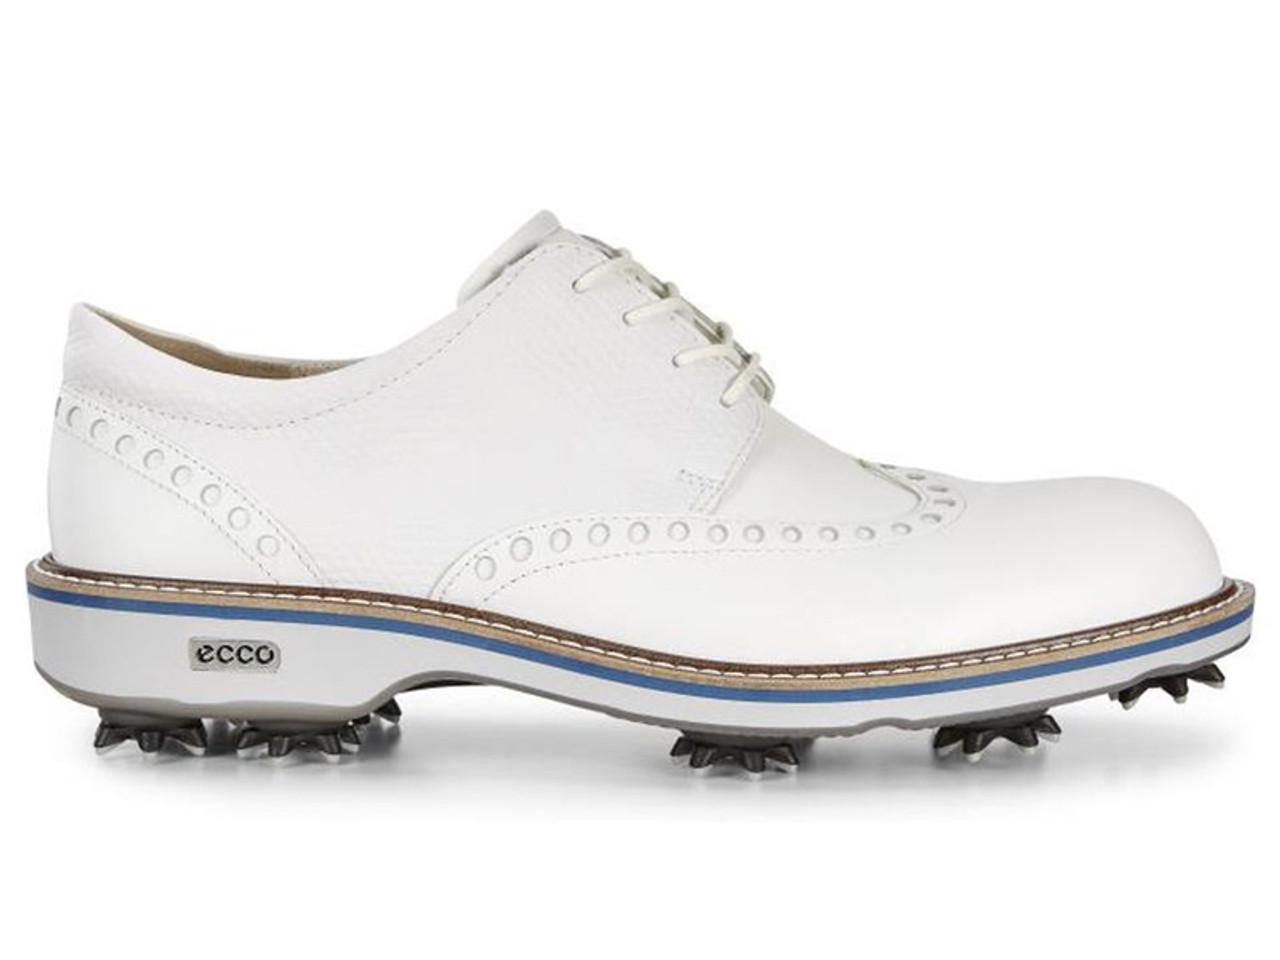 ecco classic golf shoes